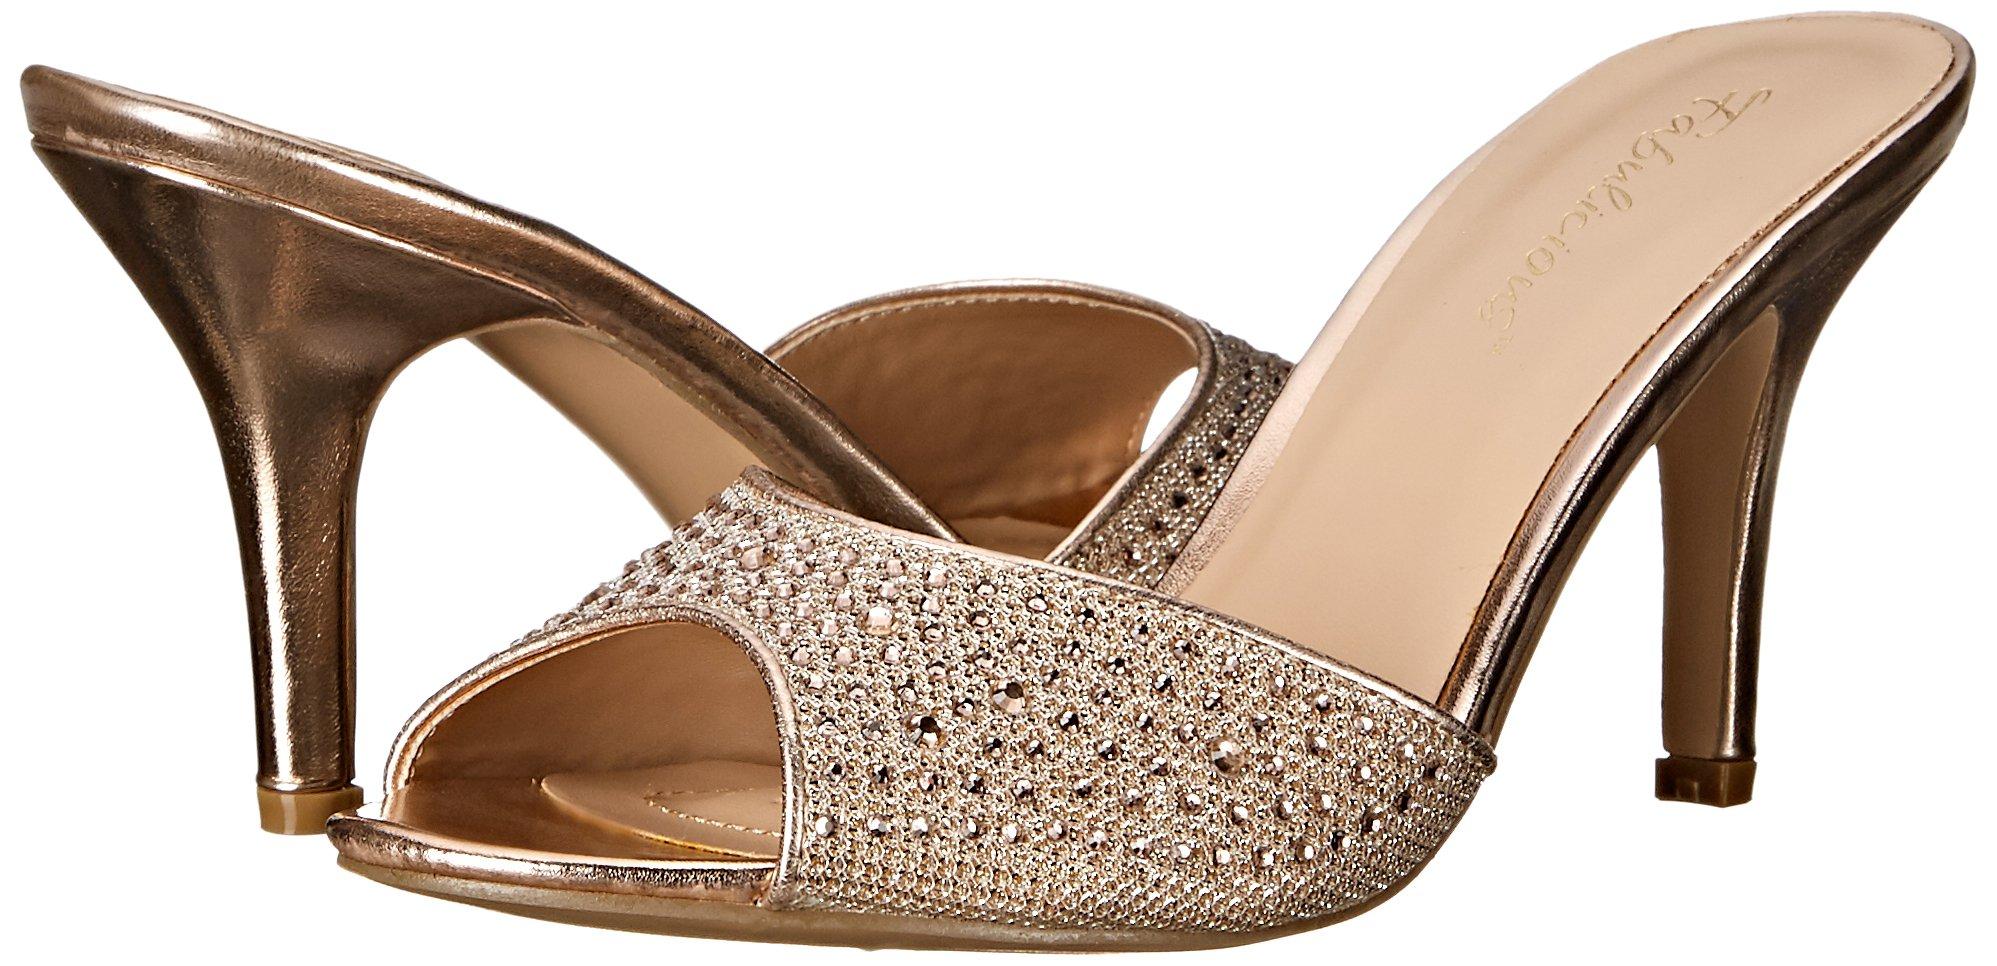 Fabulicious Women's LUCY01/Ggfa Dress Sandal, Gold Glitter Mesh Fabric, 9 M US by Fabulicious (Image #6)